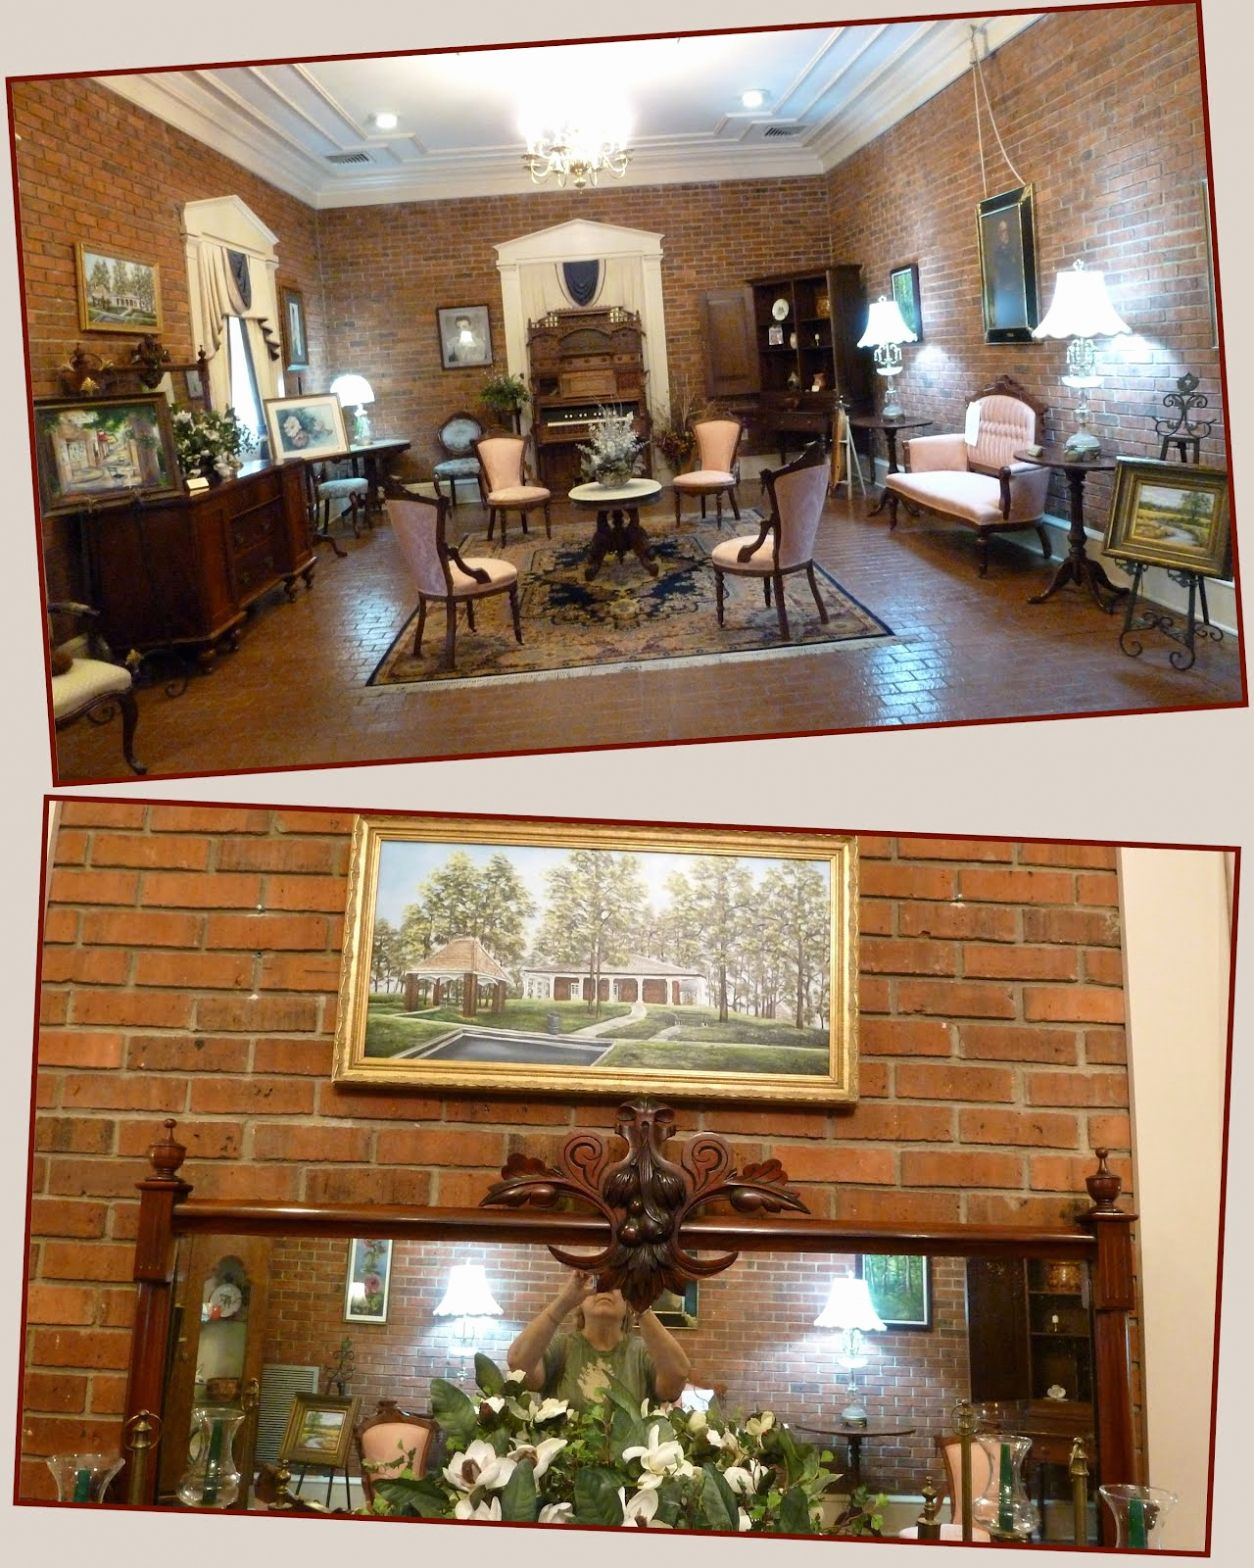 Home Decor Stores Tulsa | Decor, Home decor, House design